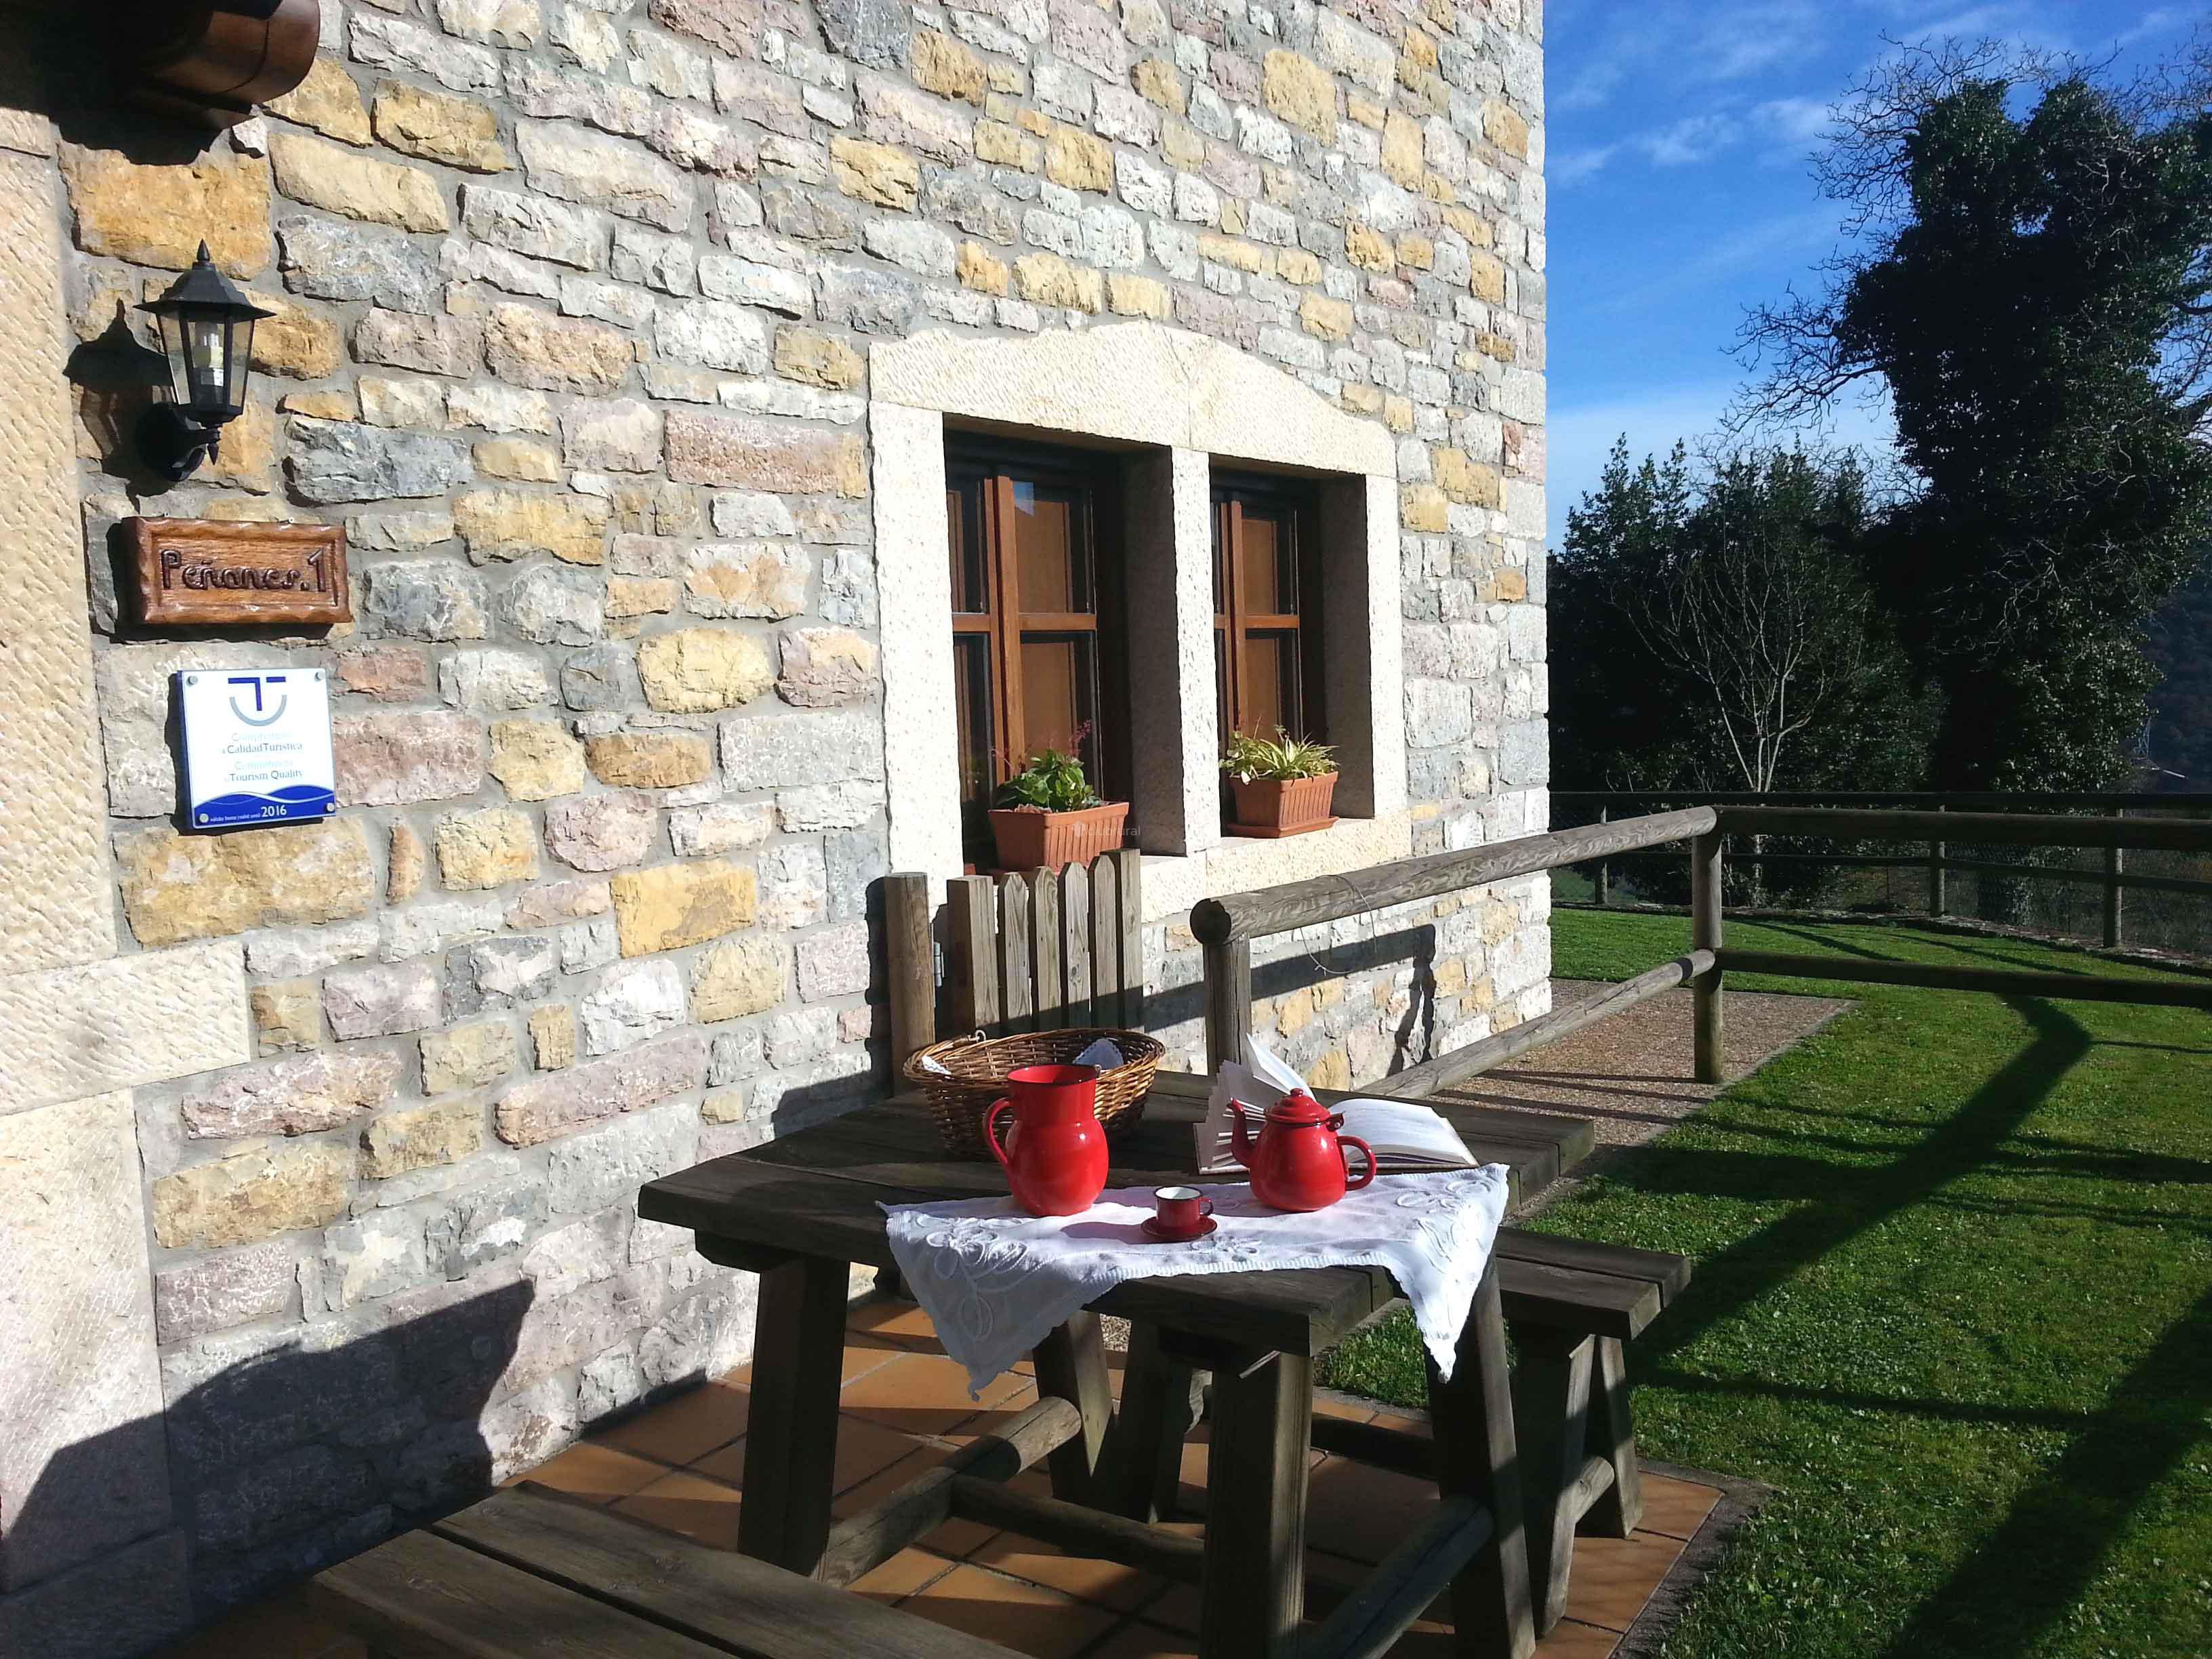 Fotos de casas de aldea pe anes asturias morc n clubrural - Casas de aldea asturias ...